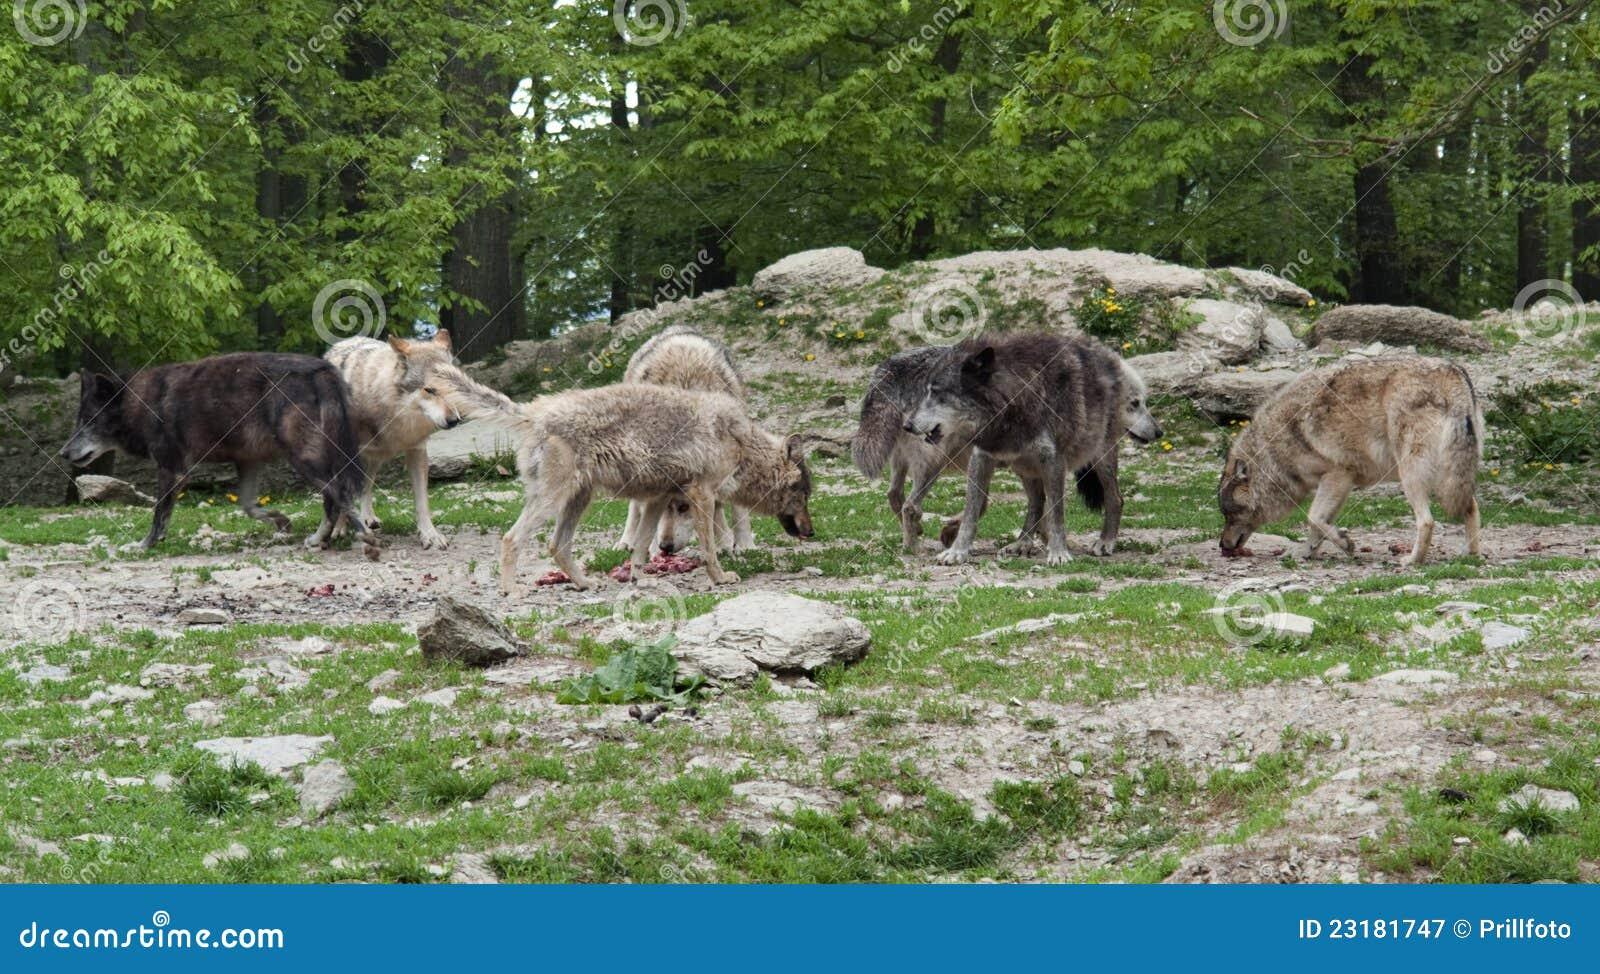 Pak Grijze Wolven dichtbij bosrand